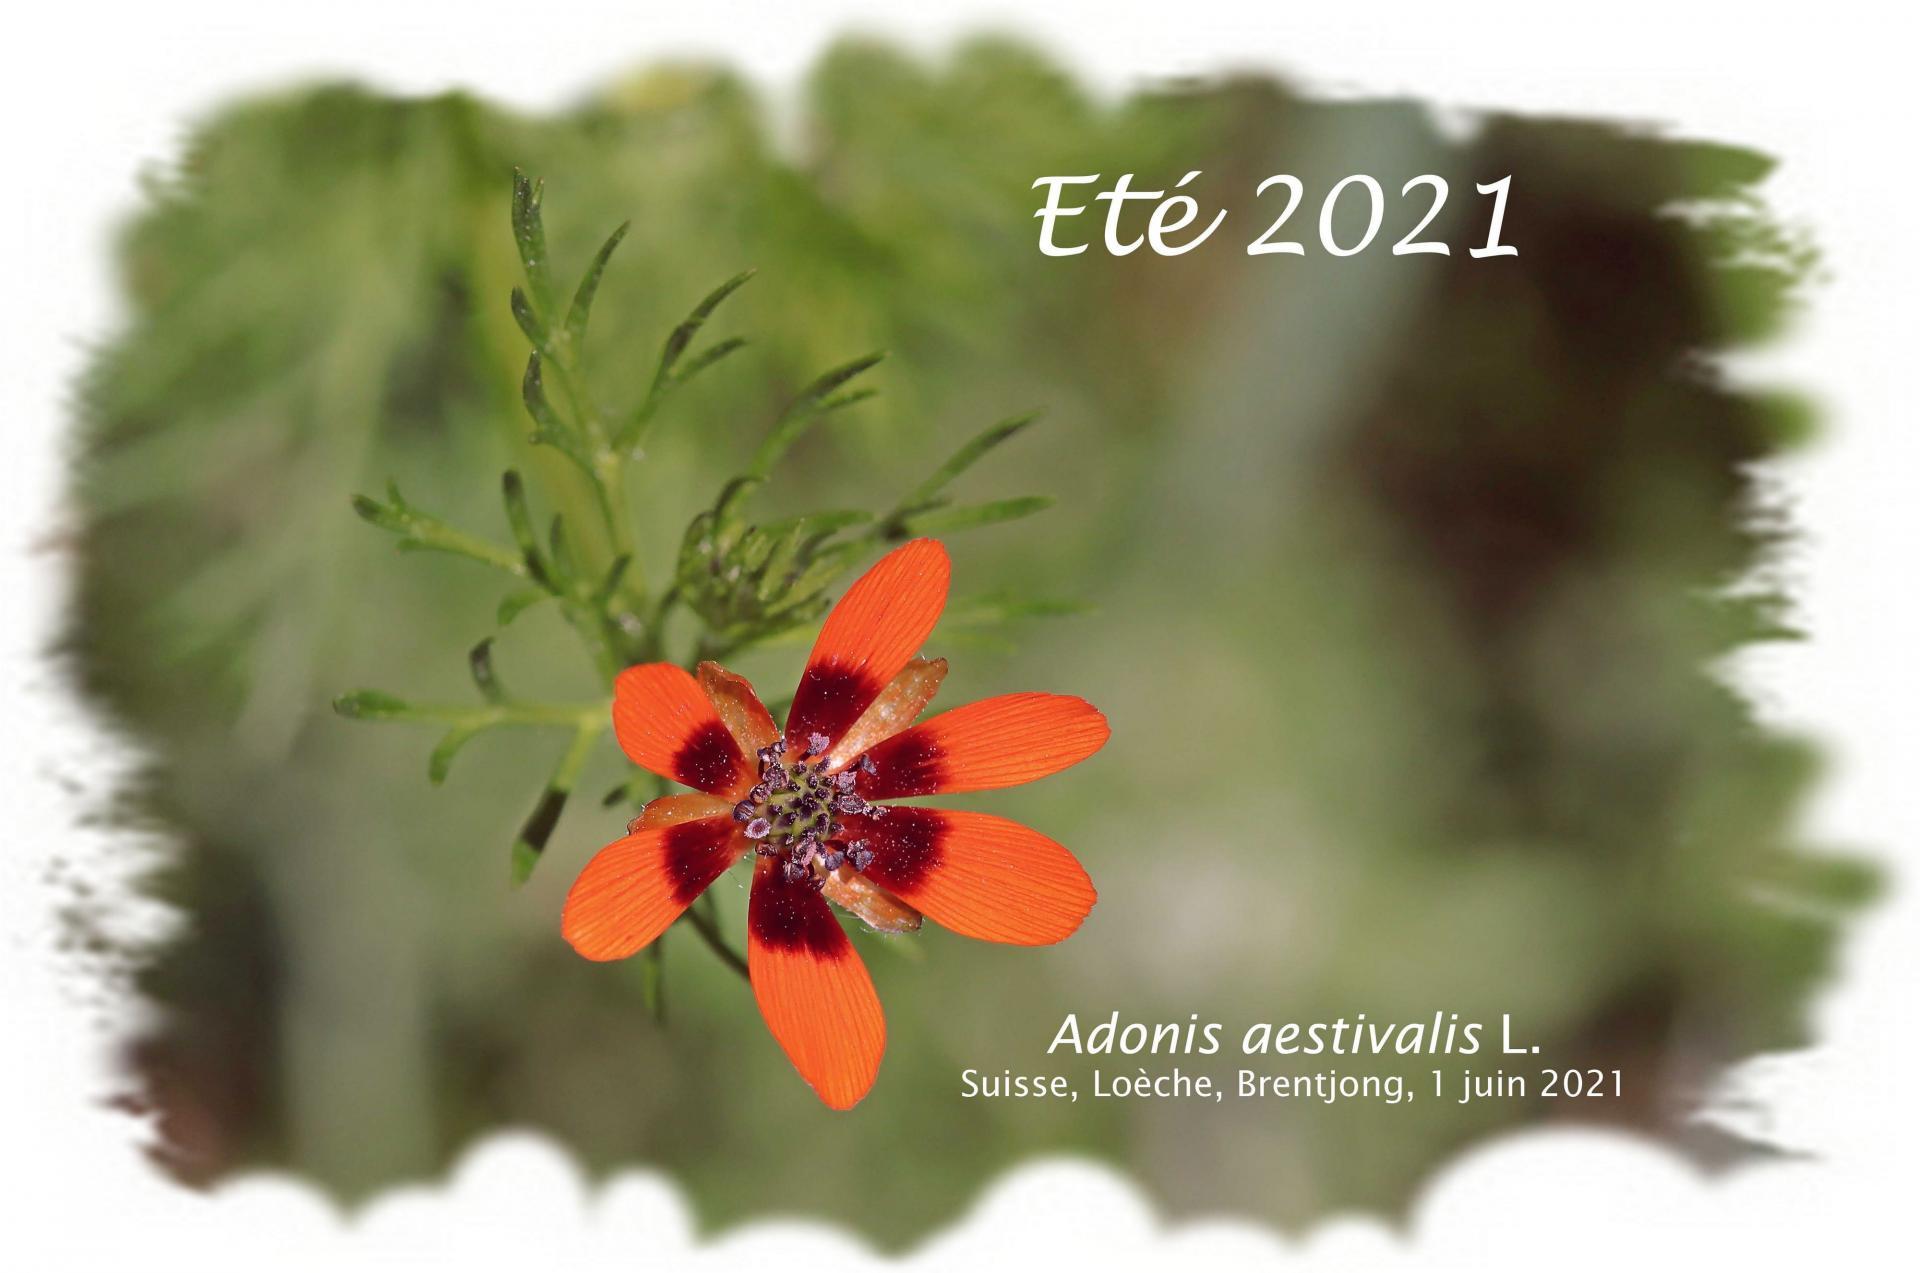 Adonis f 2021